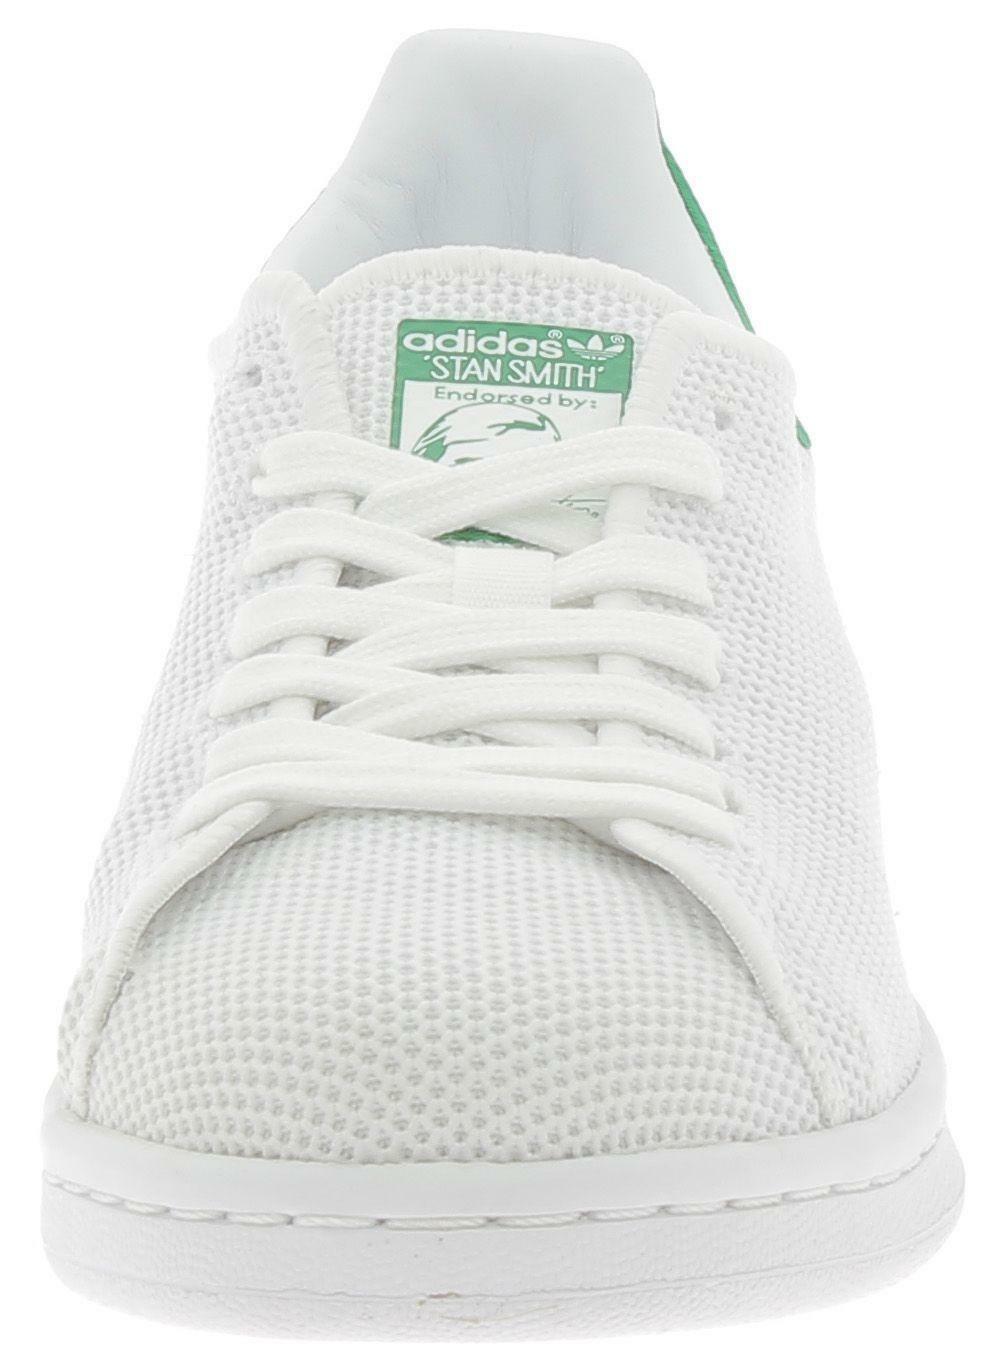 adidas adidas stan smith scarpe sportive donna bianche tela bb0065